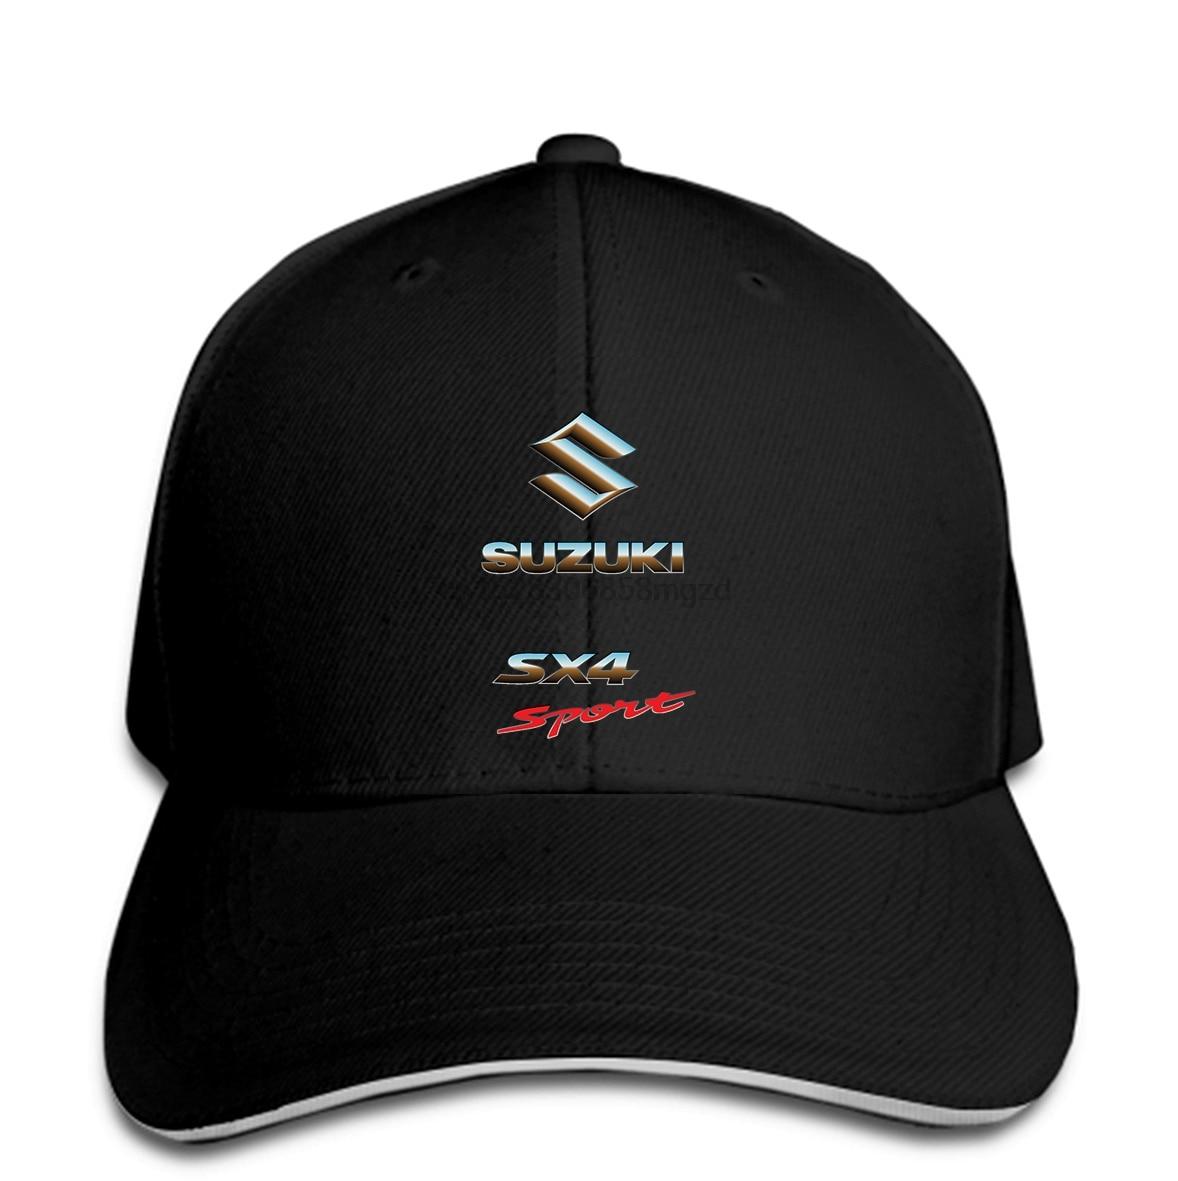 SUZUKI SX4 SPORT RALLY CAR Men Baseball Cap SUZUKI RACING TEAM Men Baseball Cap Snapback Cap Women Hat Peaked